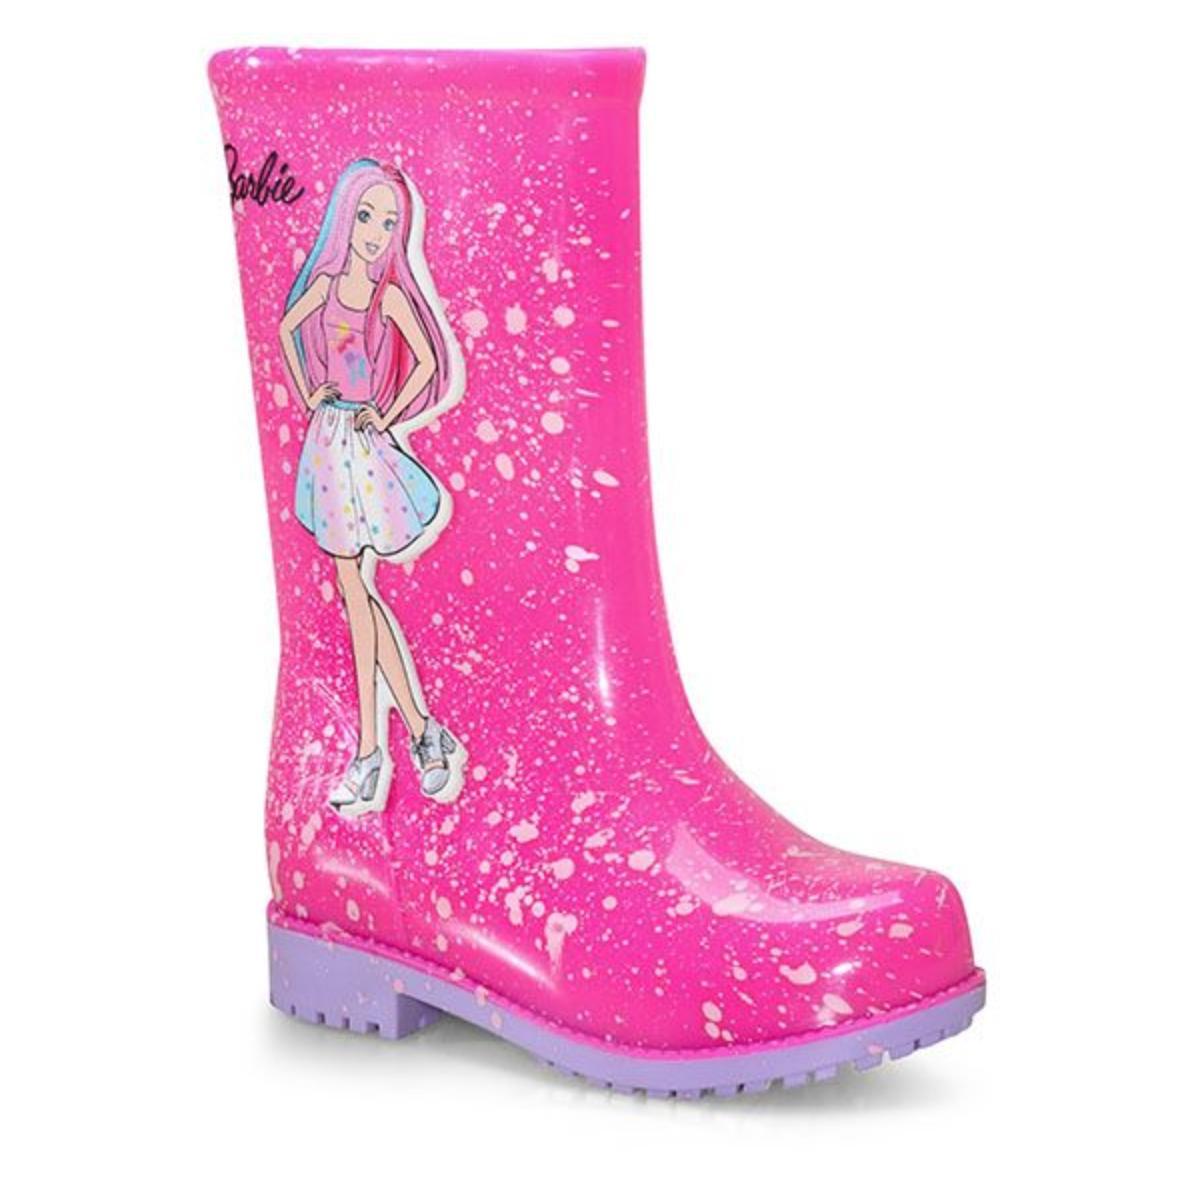 Galocha Fem Infantil Grendene 22560 50511 Barbie Fashion Rosa/lilas